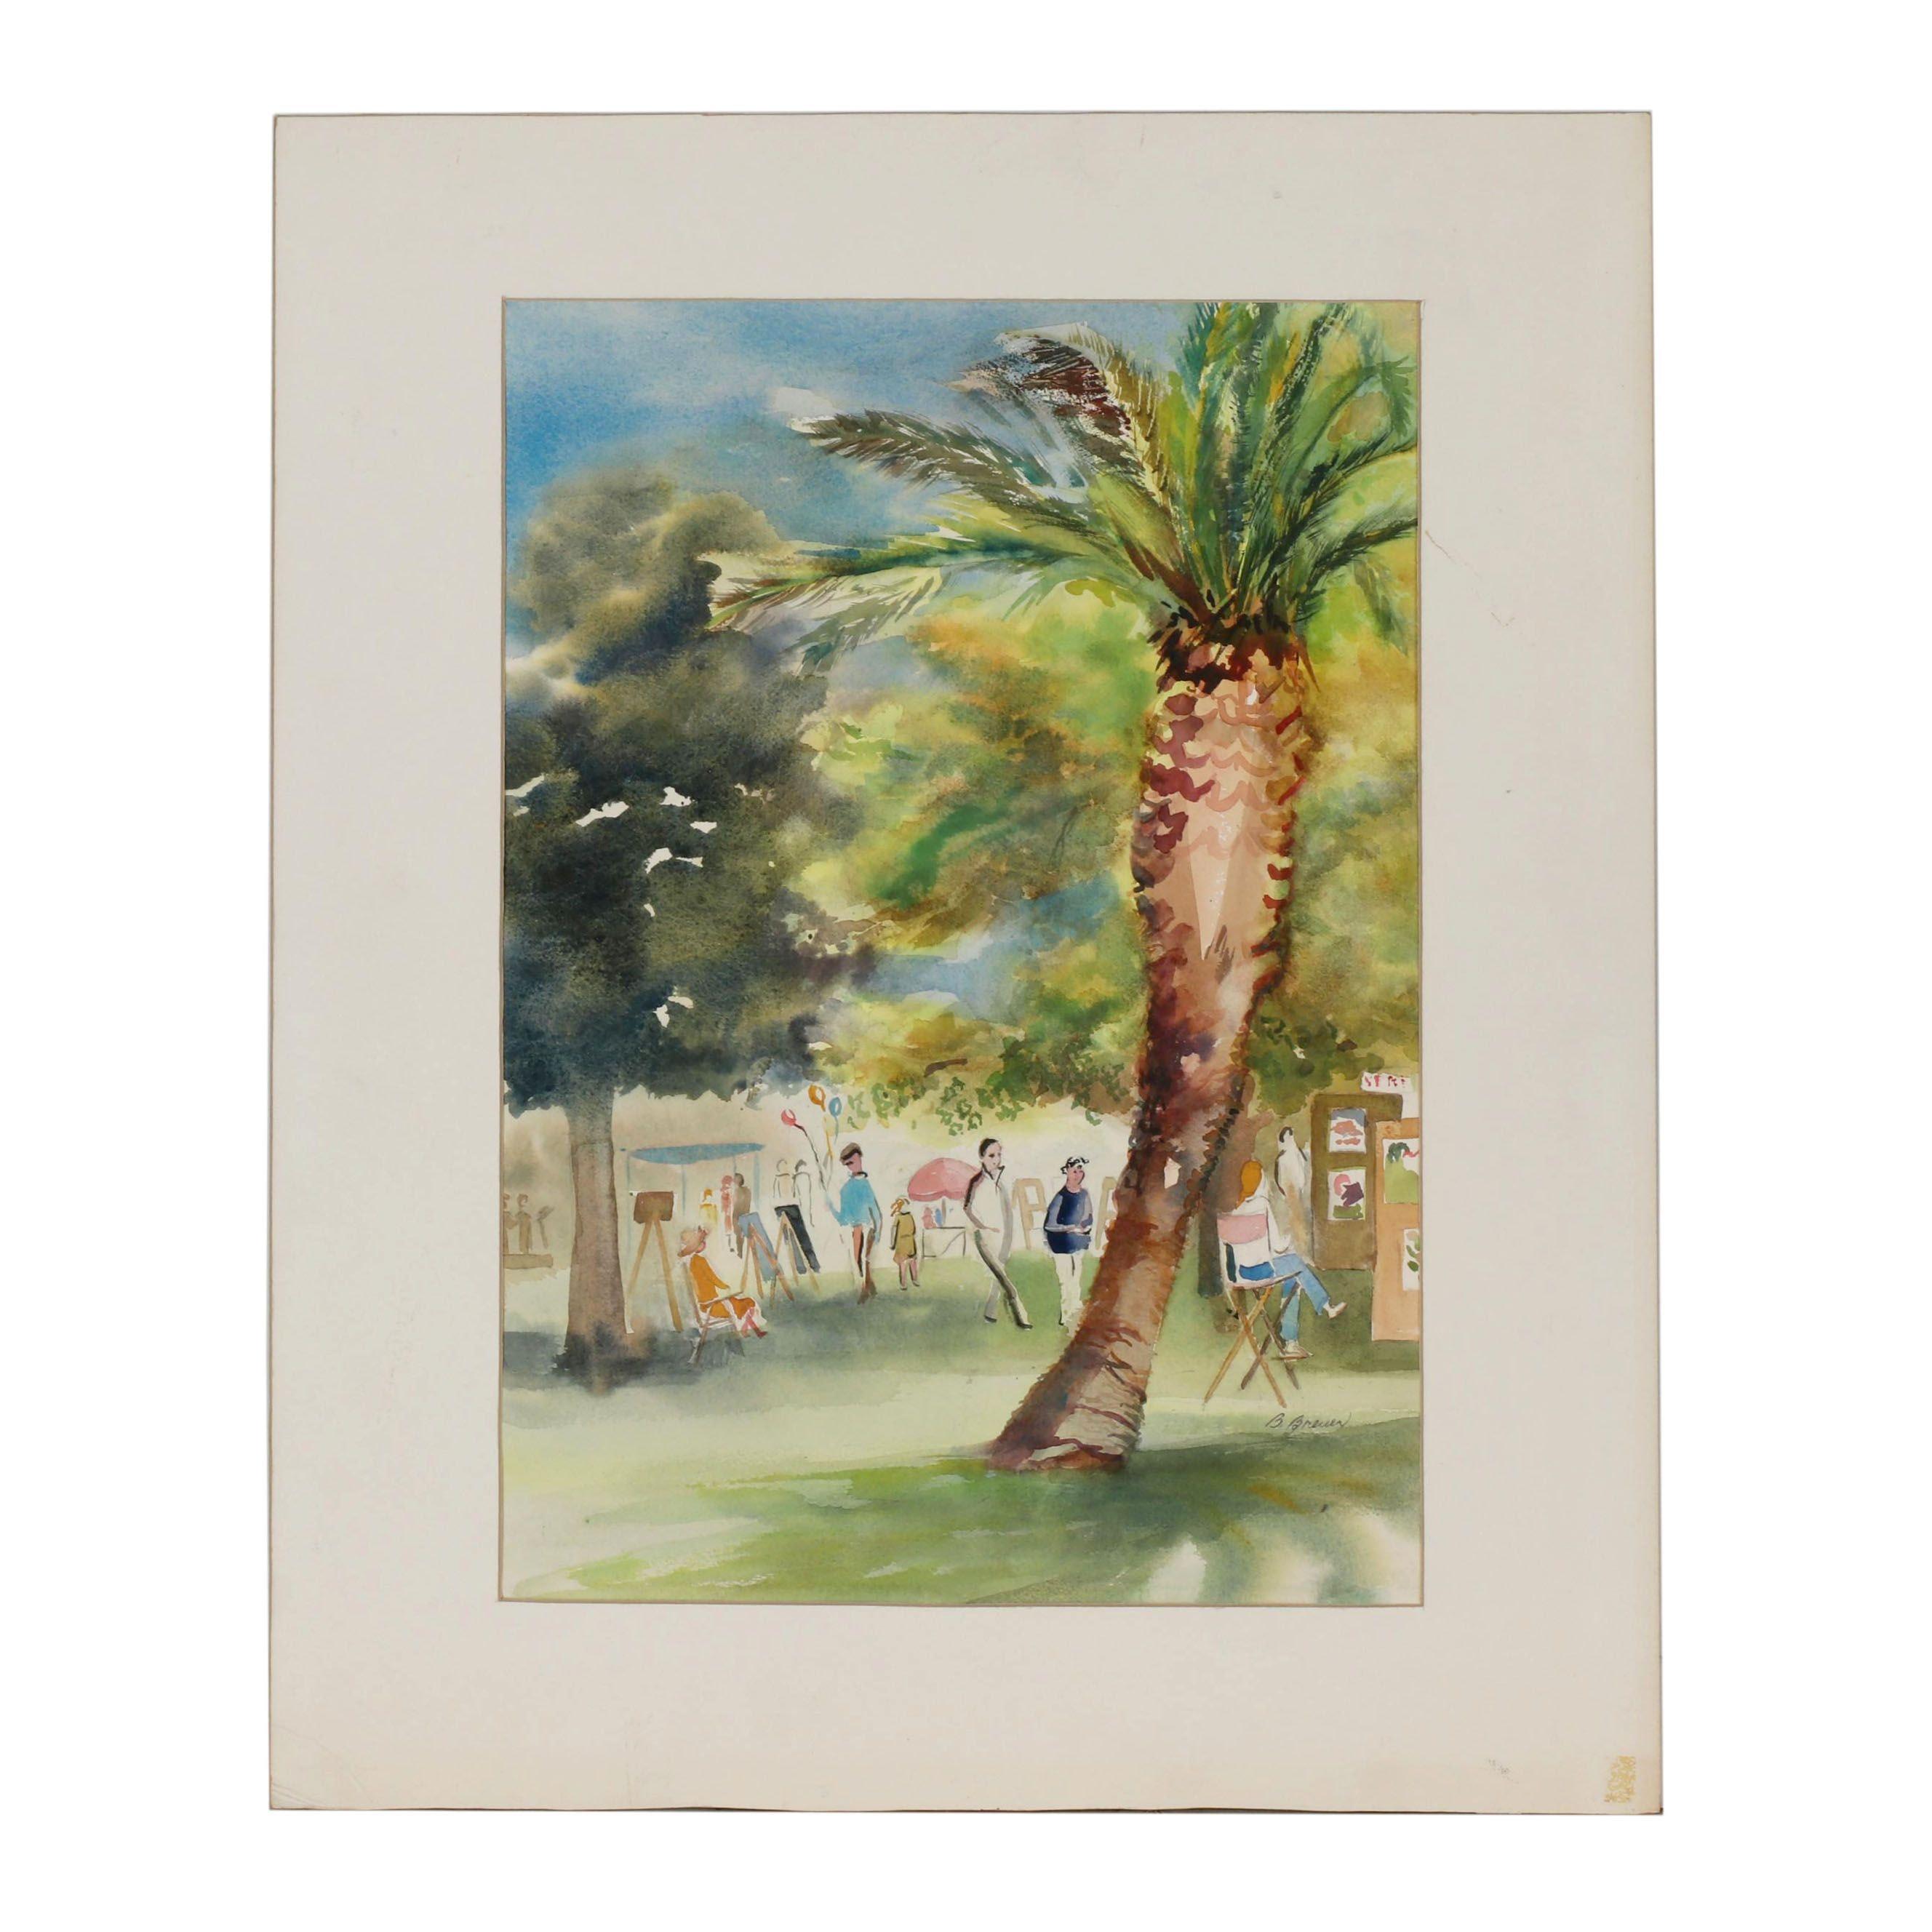 B. Breuer Watercolor Painting of Park Scene